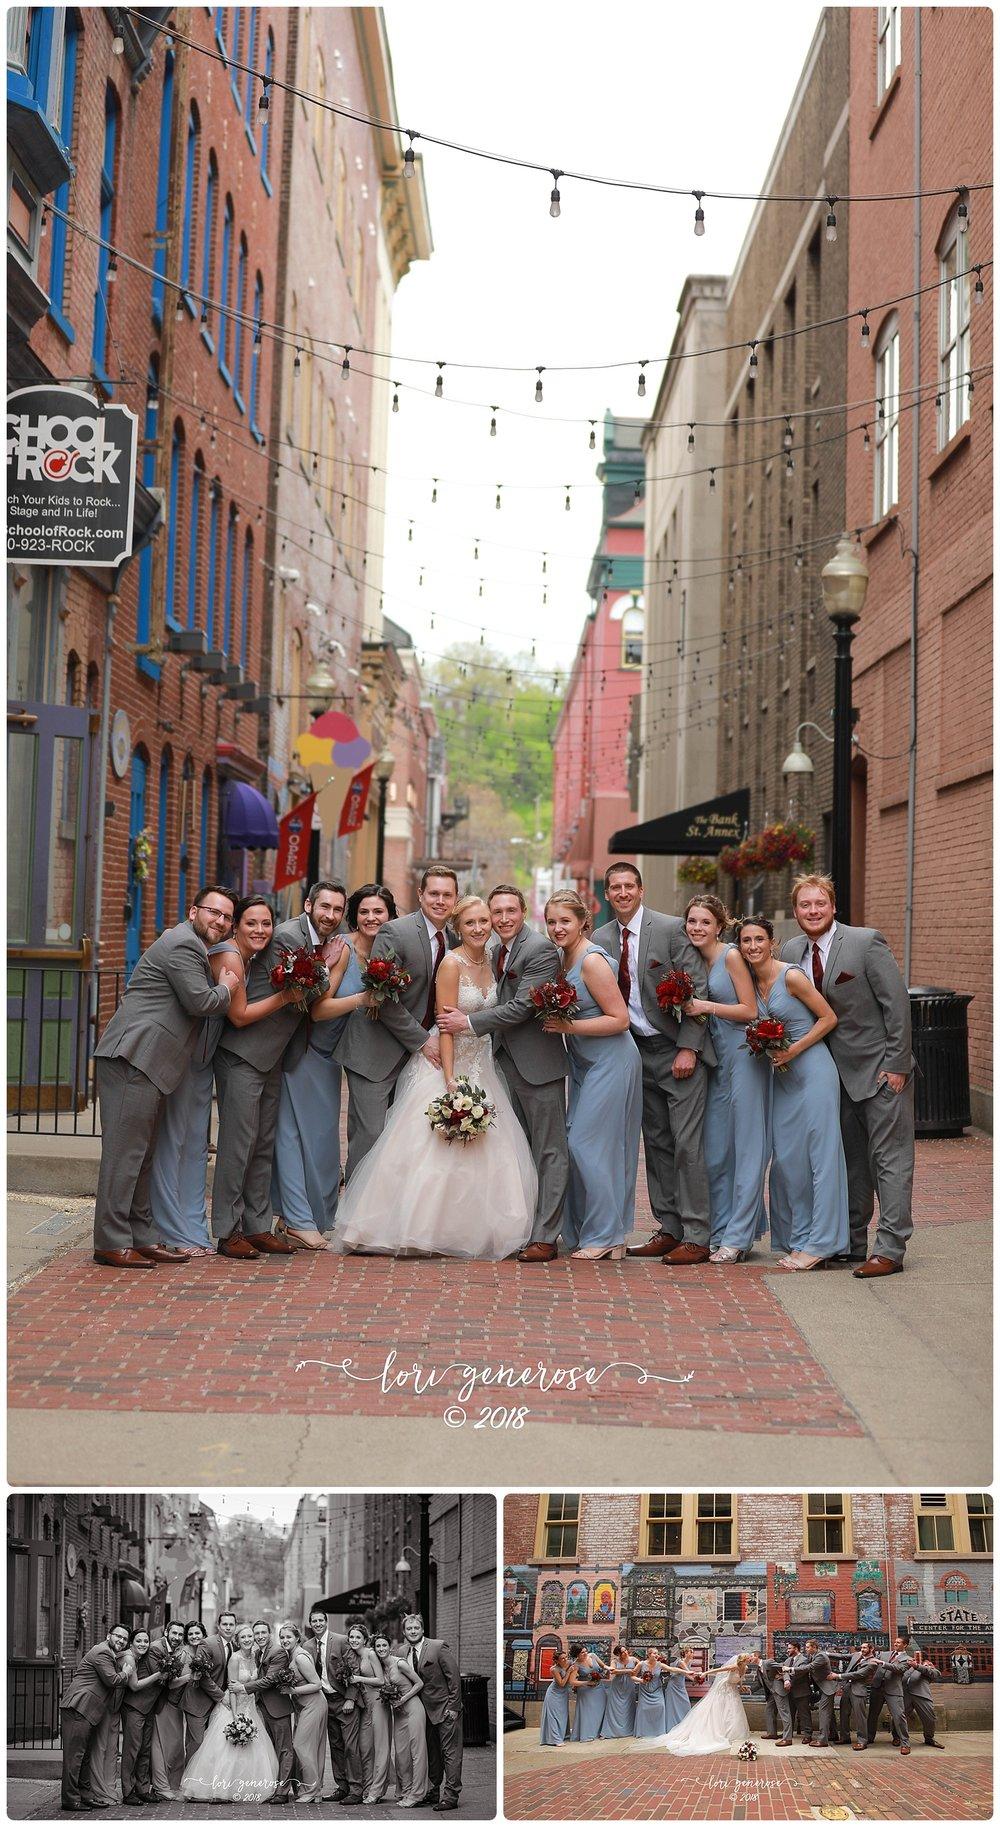 lgphotographylorigenerosetheinnatpoconomanorpaweddingvenuebridalpartybankstreetalleyeastonpa.jpg